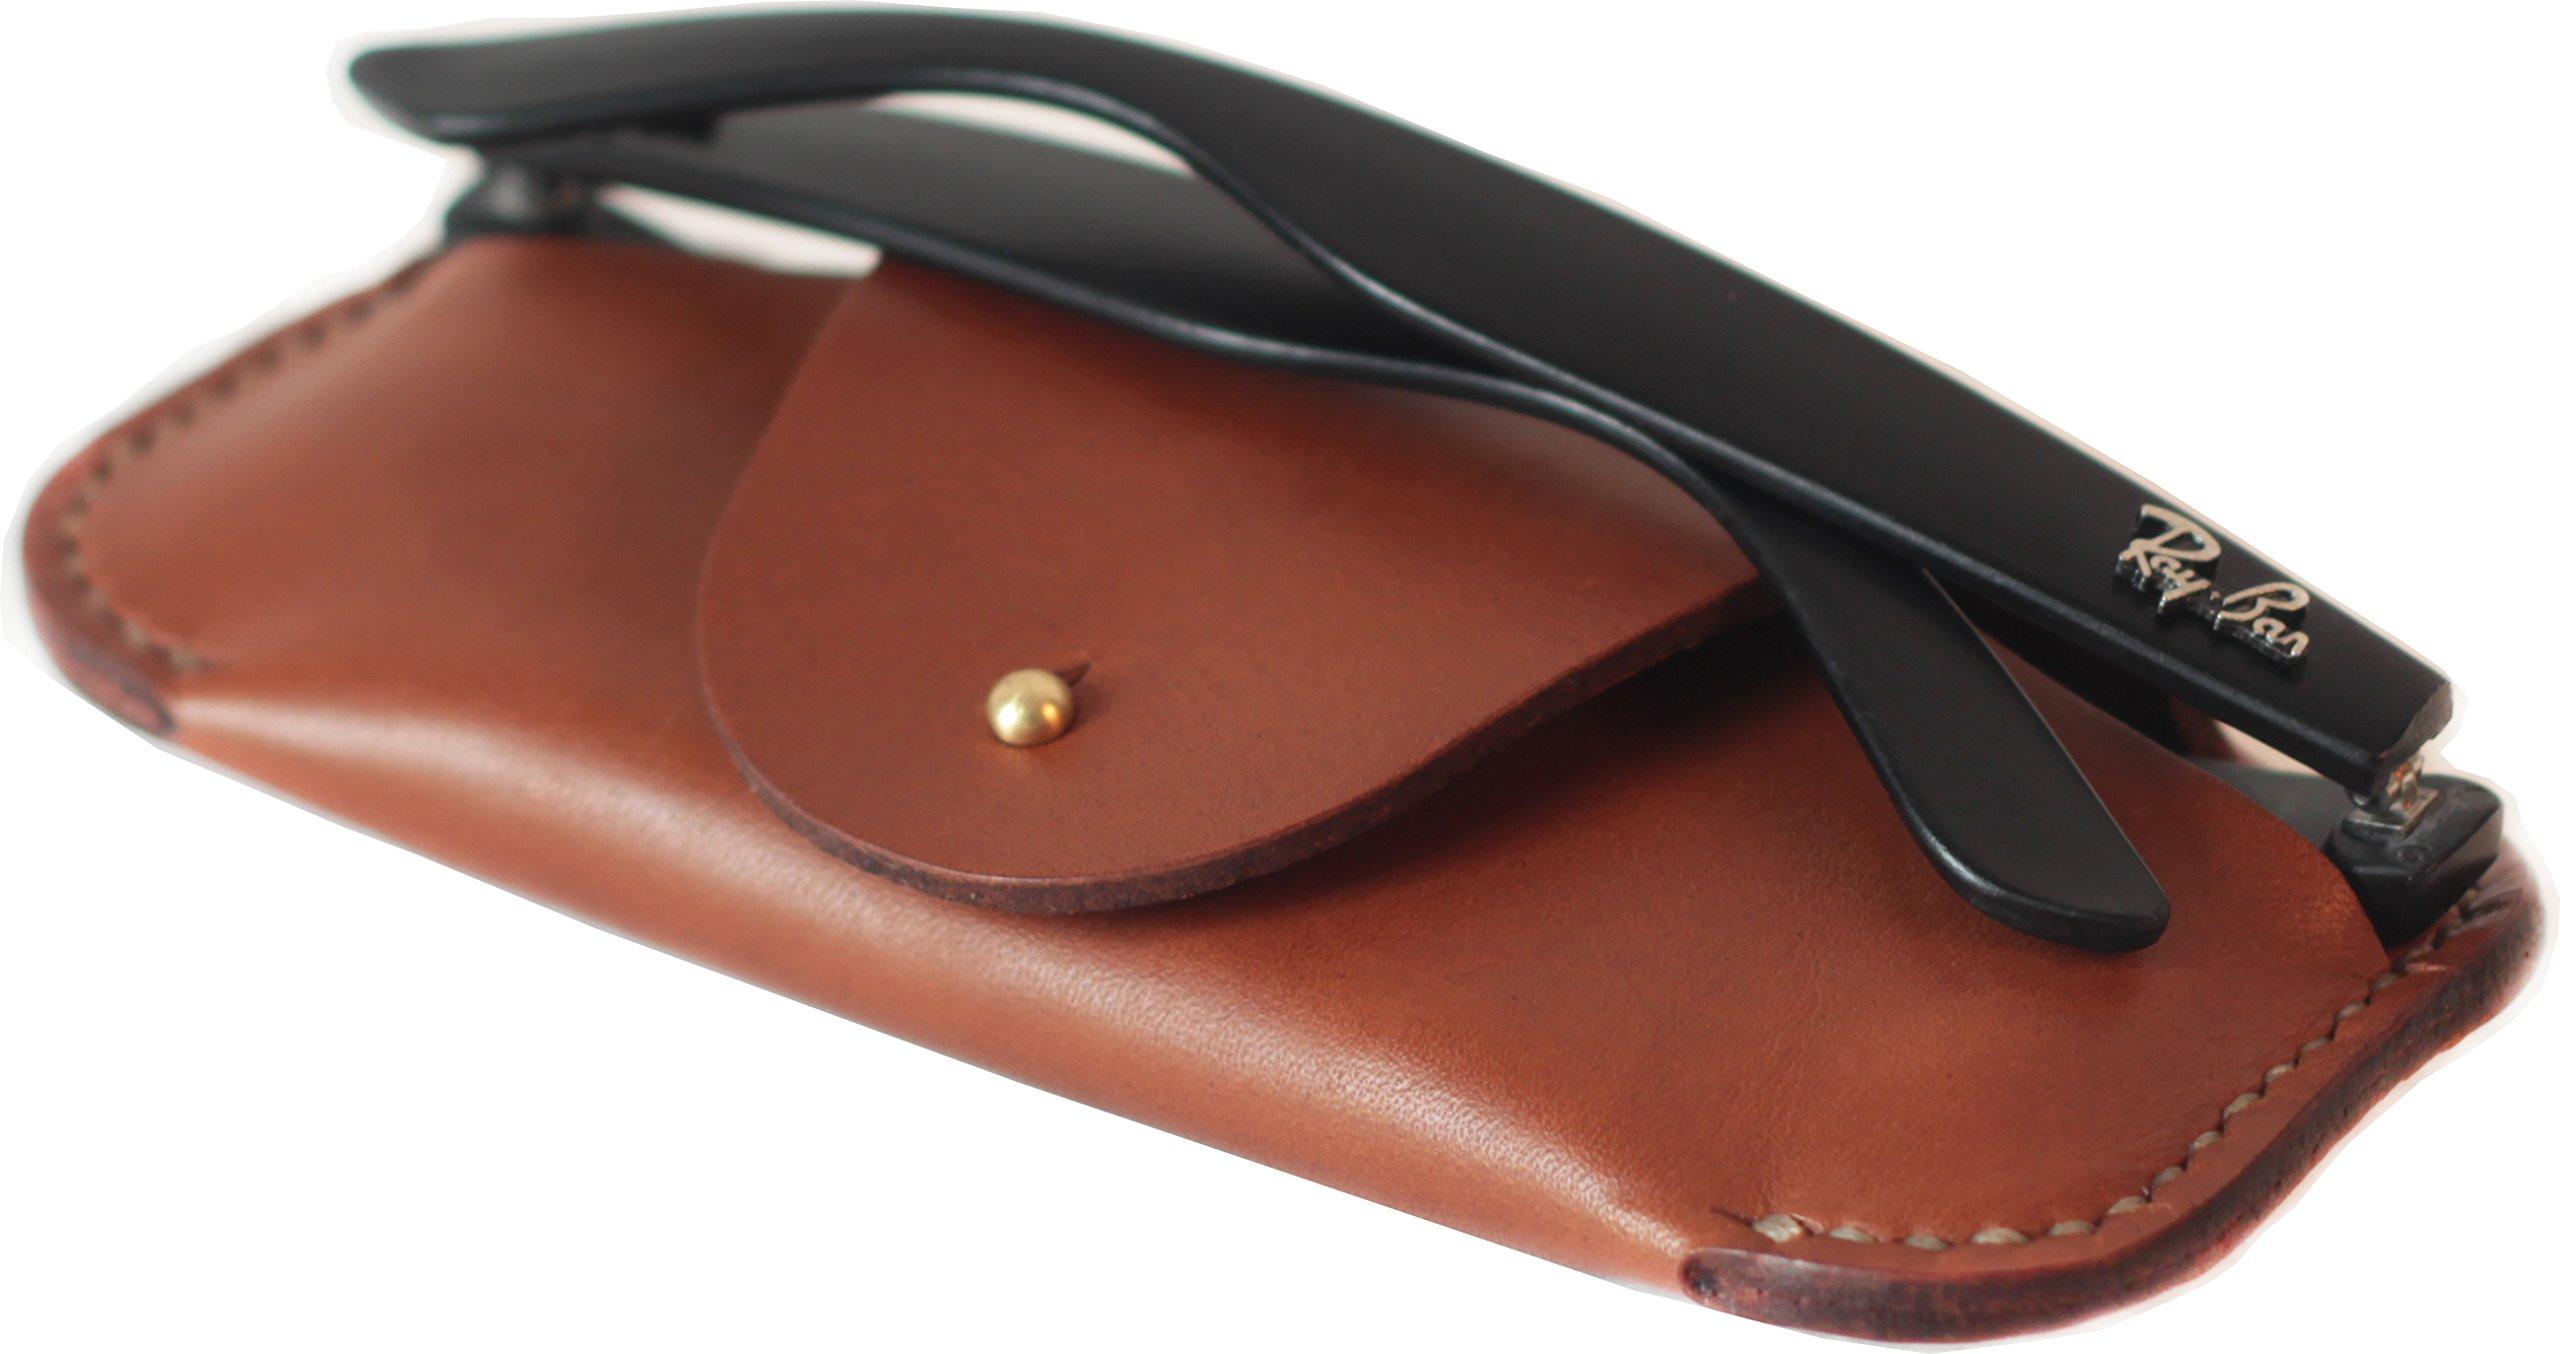 MEKU Handmade Leather Eyeglass Case Sunglass Holder